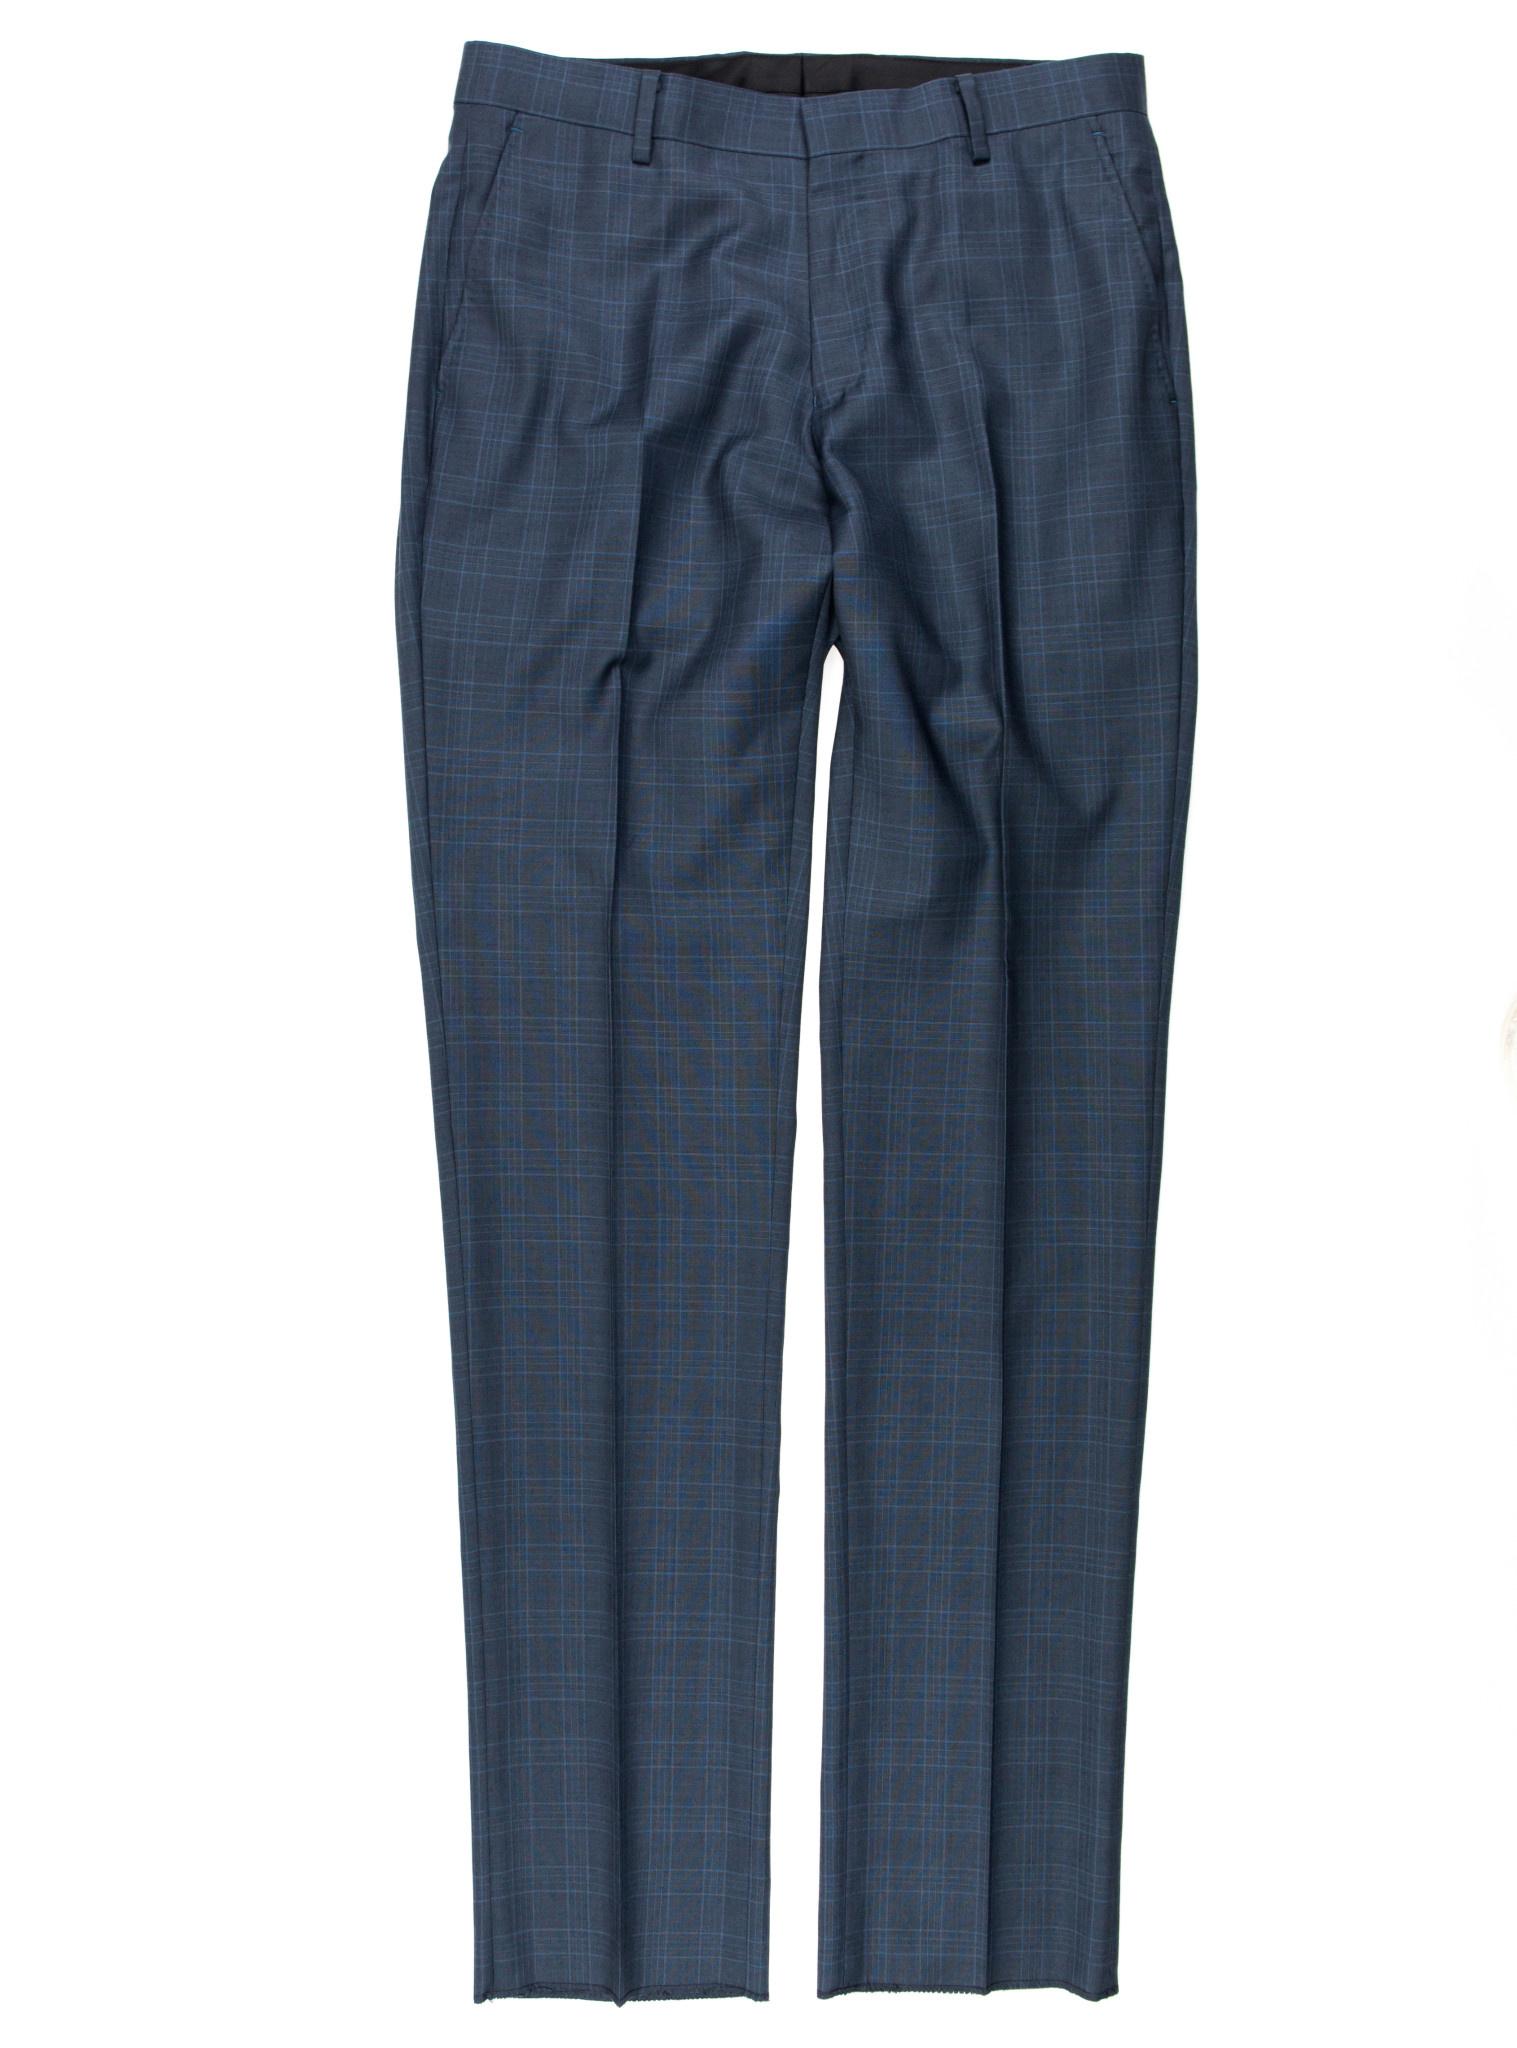 Adder S130s Suit-2